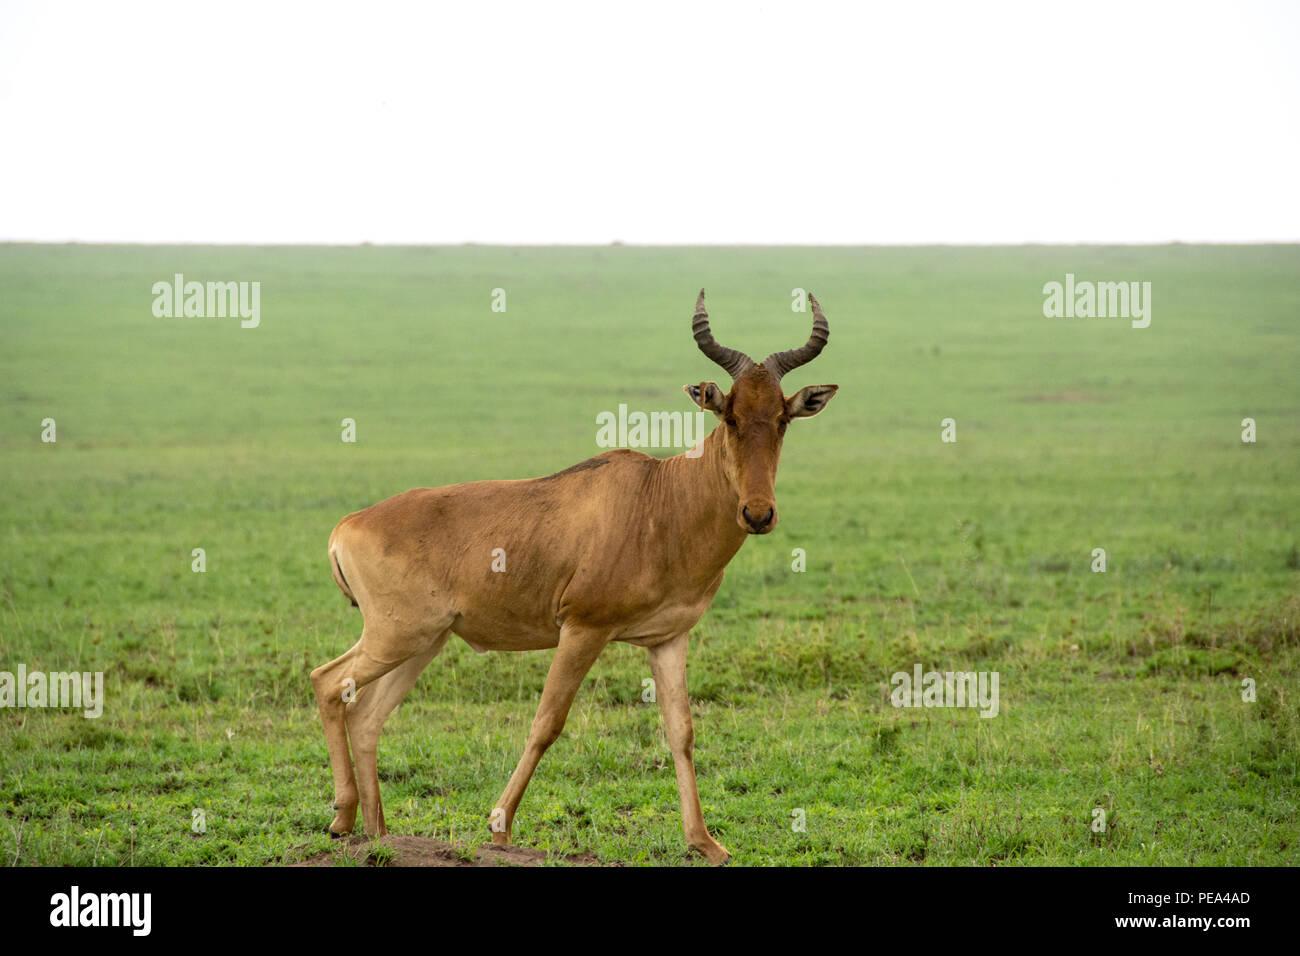 Topi grazing in the plains of Serengeti National Park, Tanzania - Stock Image